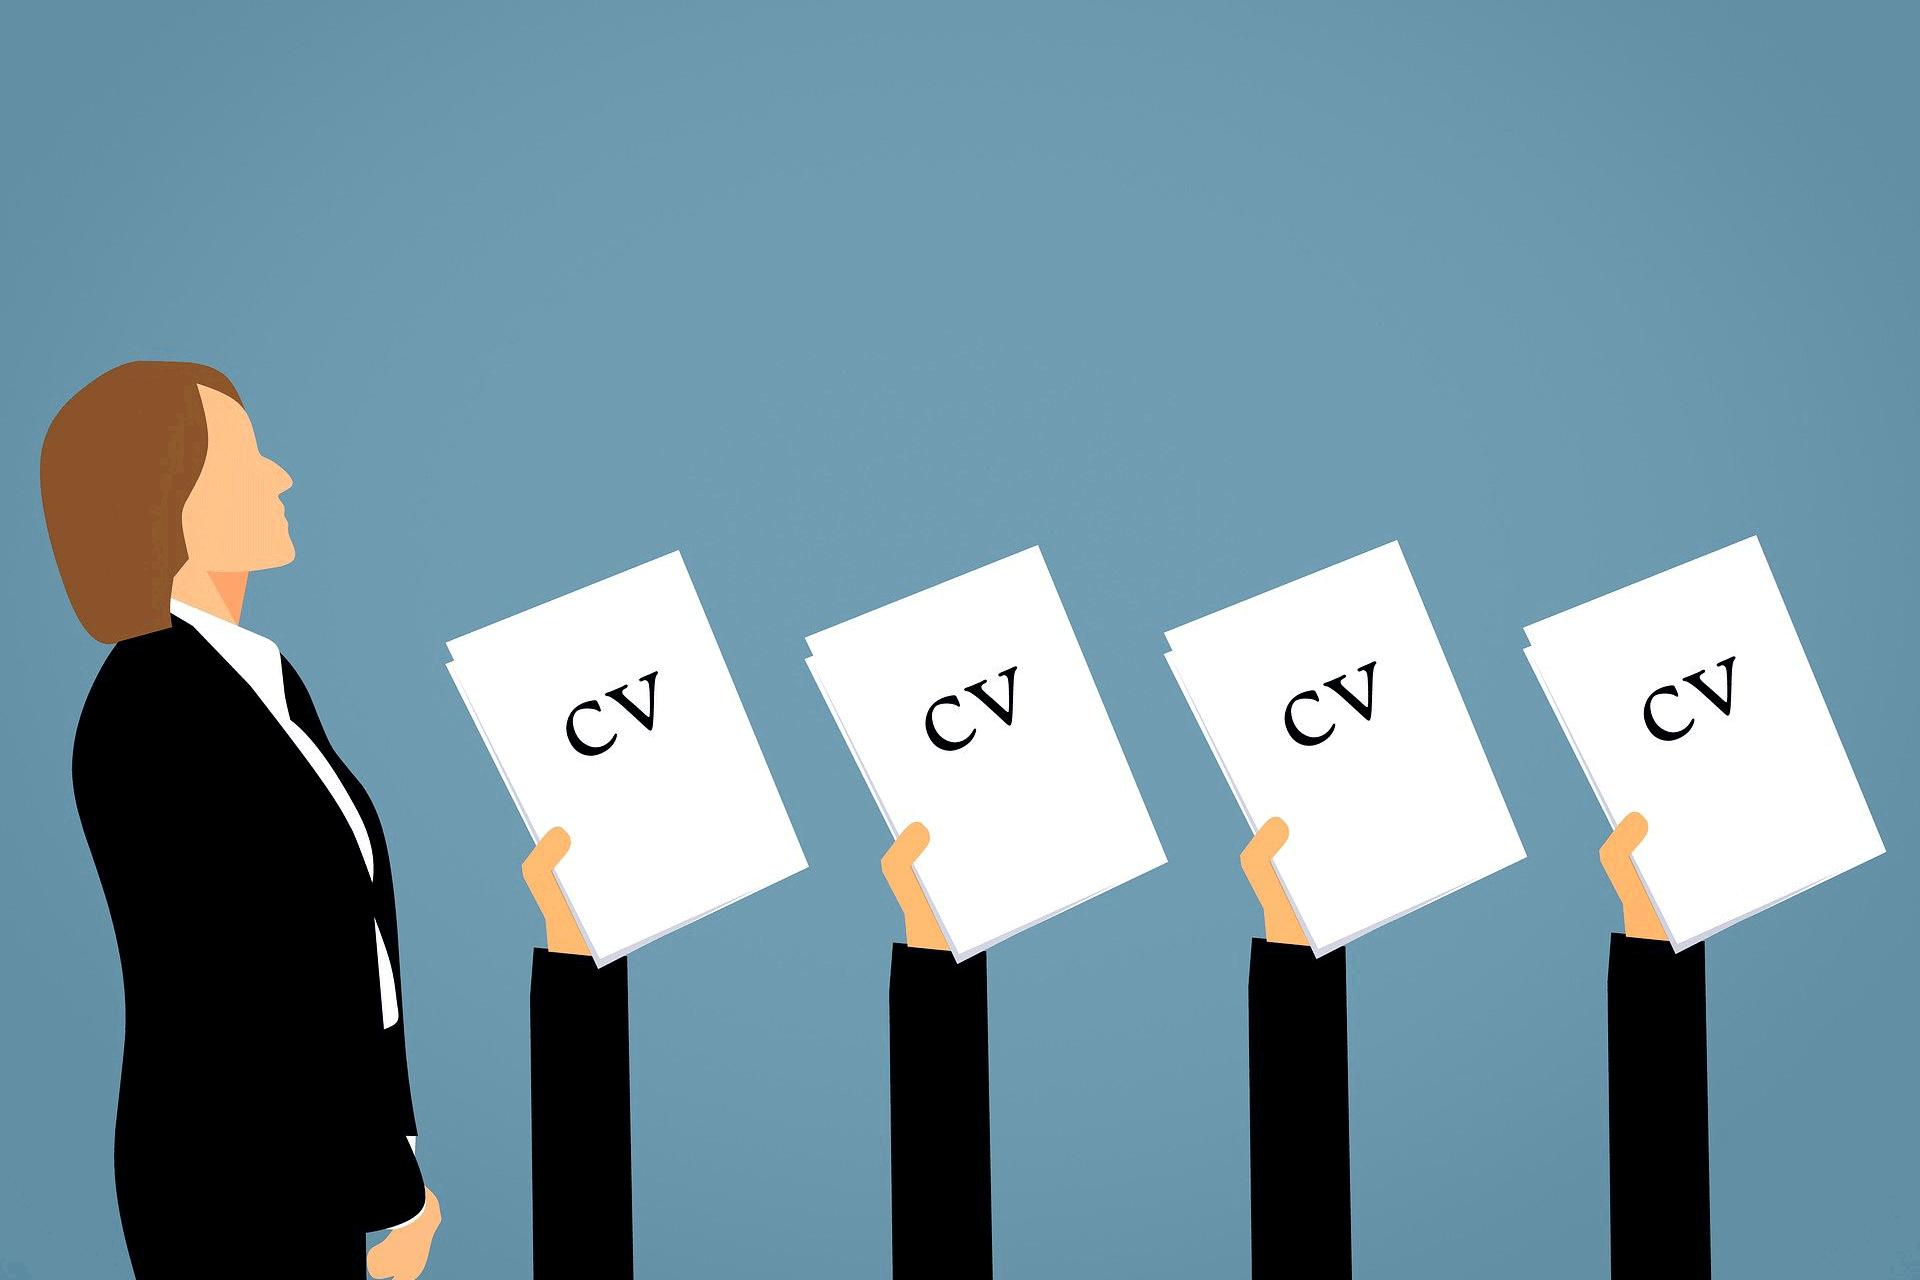 CV graphic